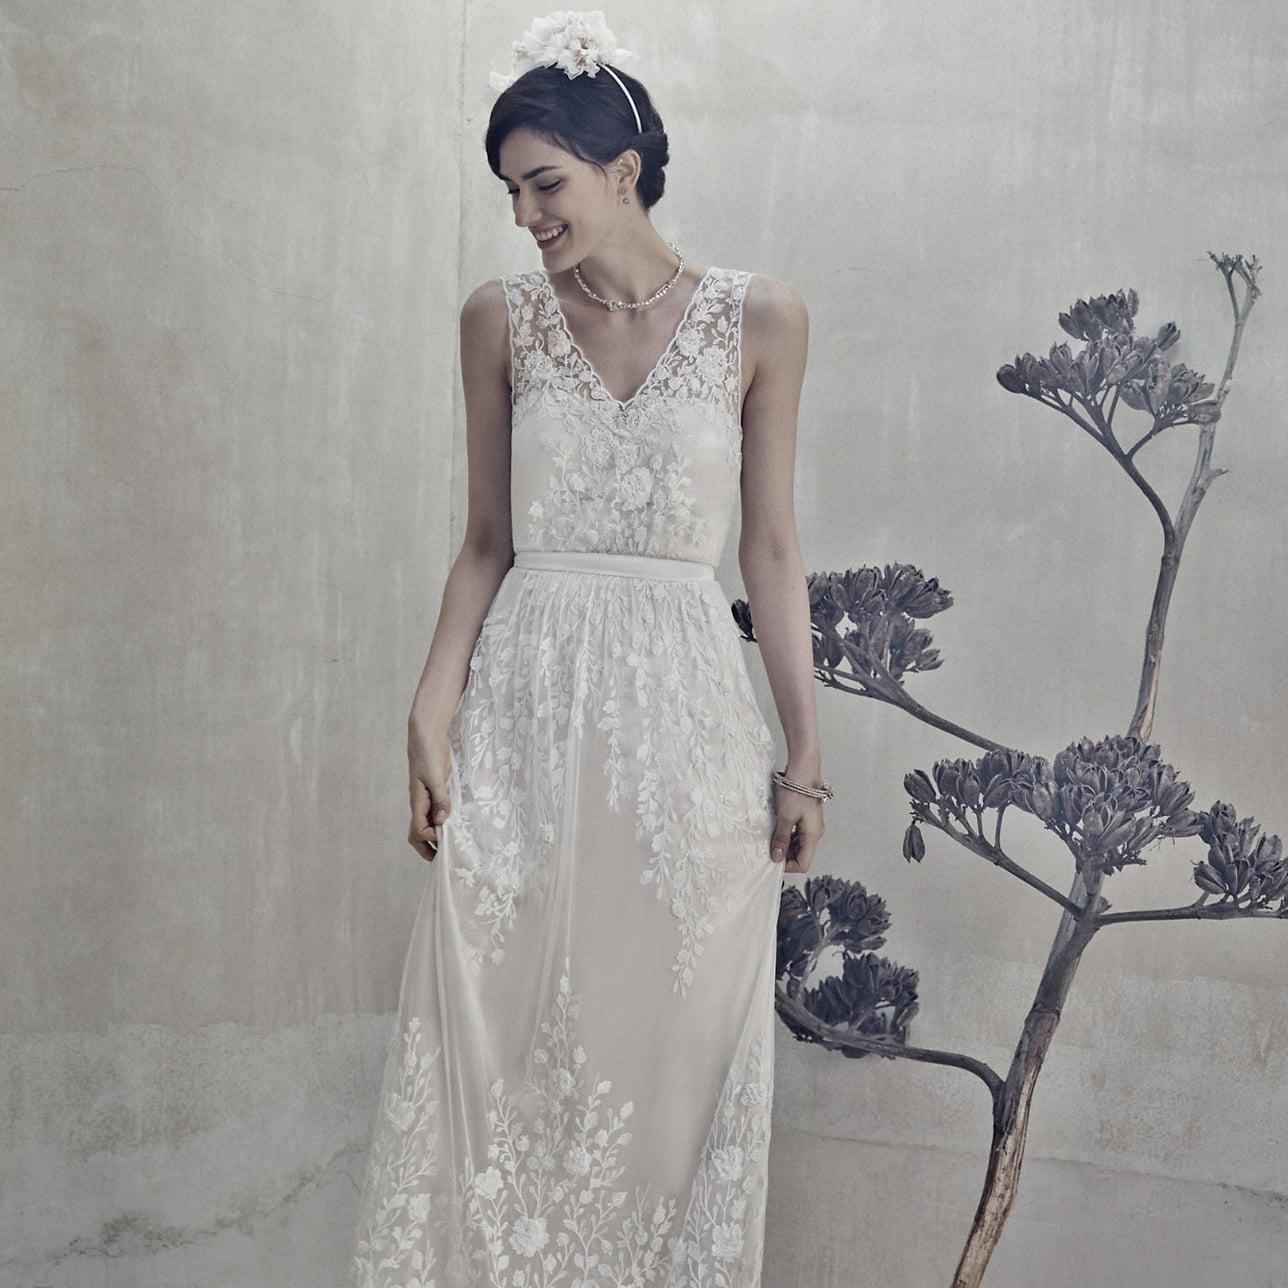 Outnet Wedding Dresses 86 Marvelous